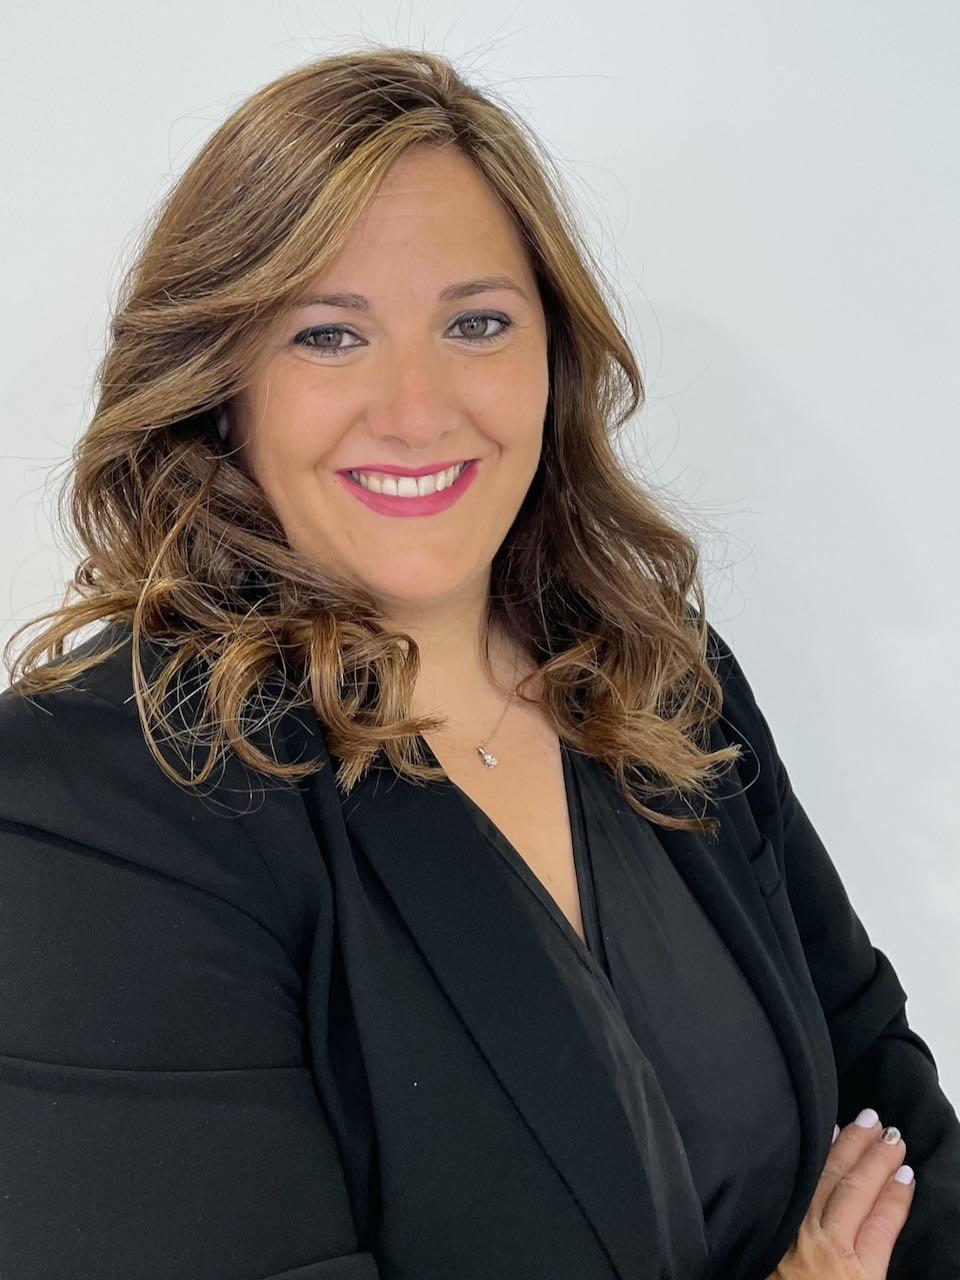 Sra. Yolanda Alarcón Toribio